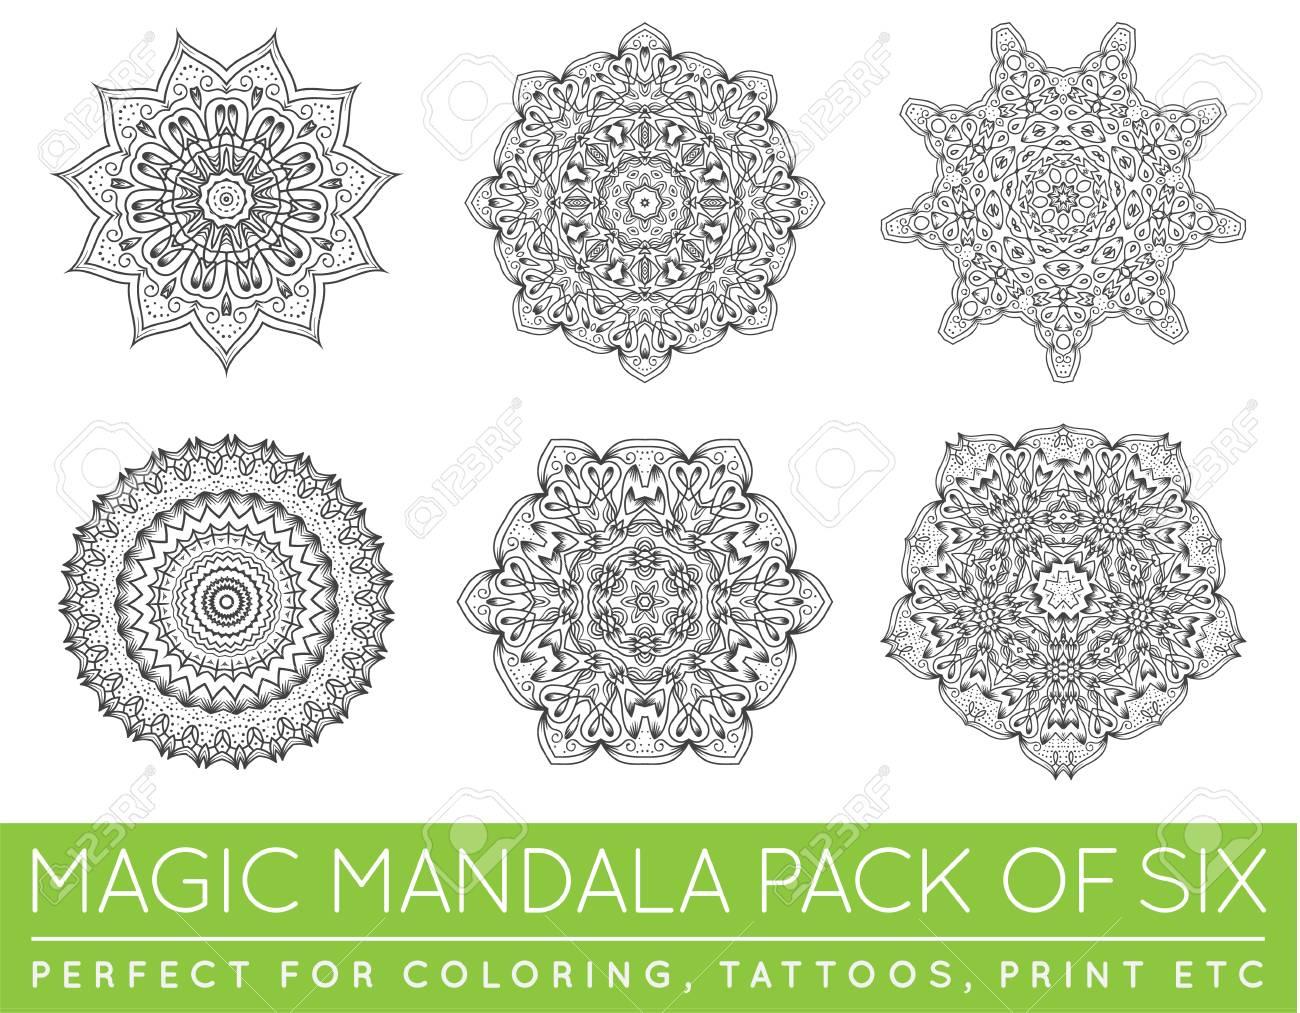 Conjunto De Tatuaje Mandala Vector Mandala étnica Del Tatuaje Parece